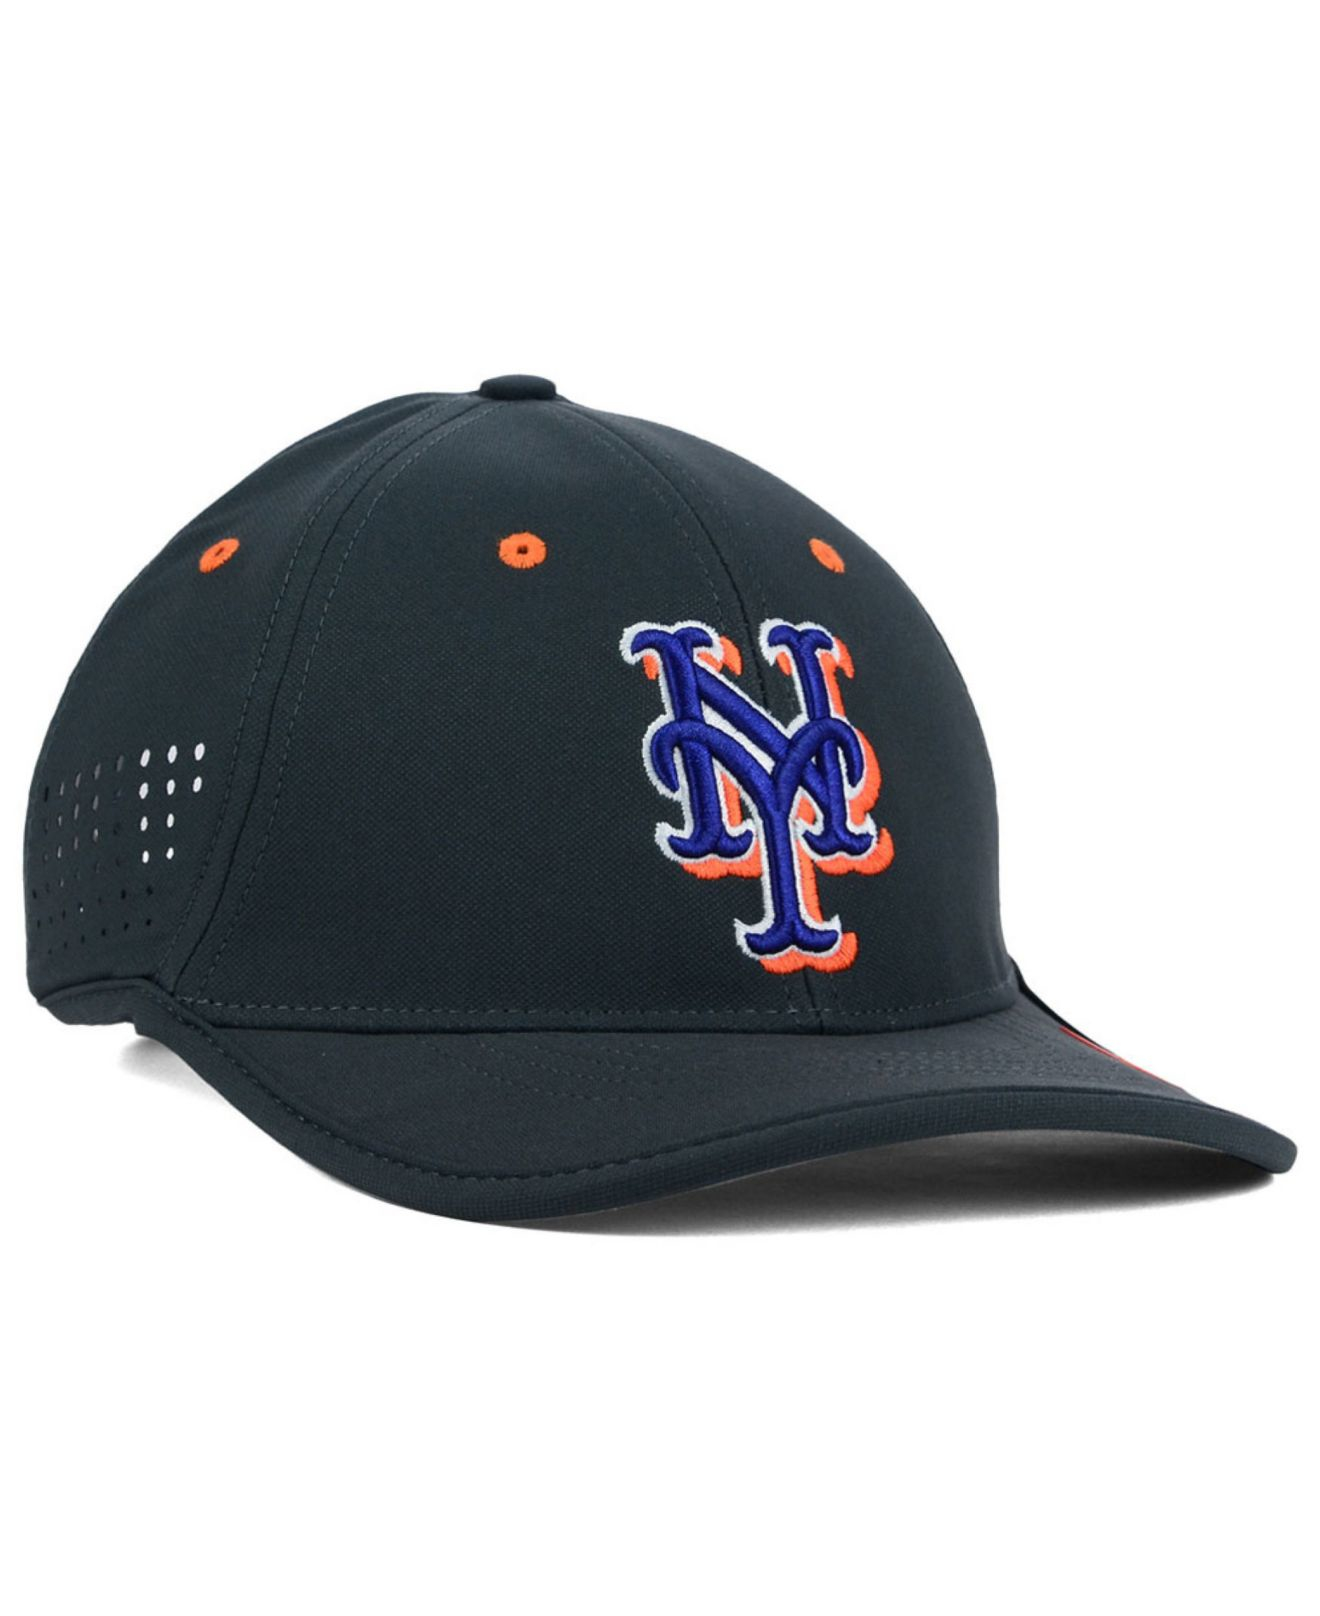 5cac3669de8ff ... low price lyst nike new york mets vapor swoosh adjustable cap in gray  for men 981ac